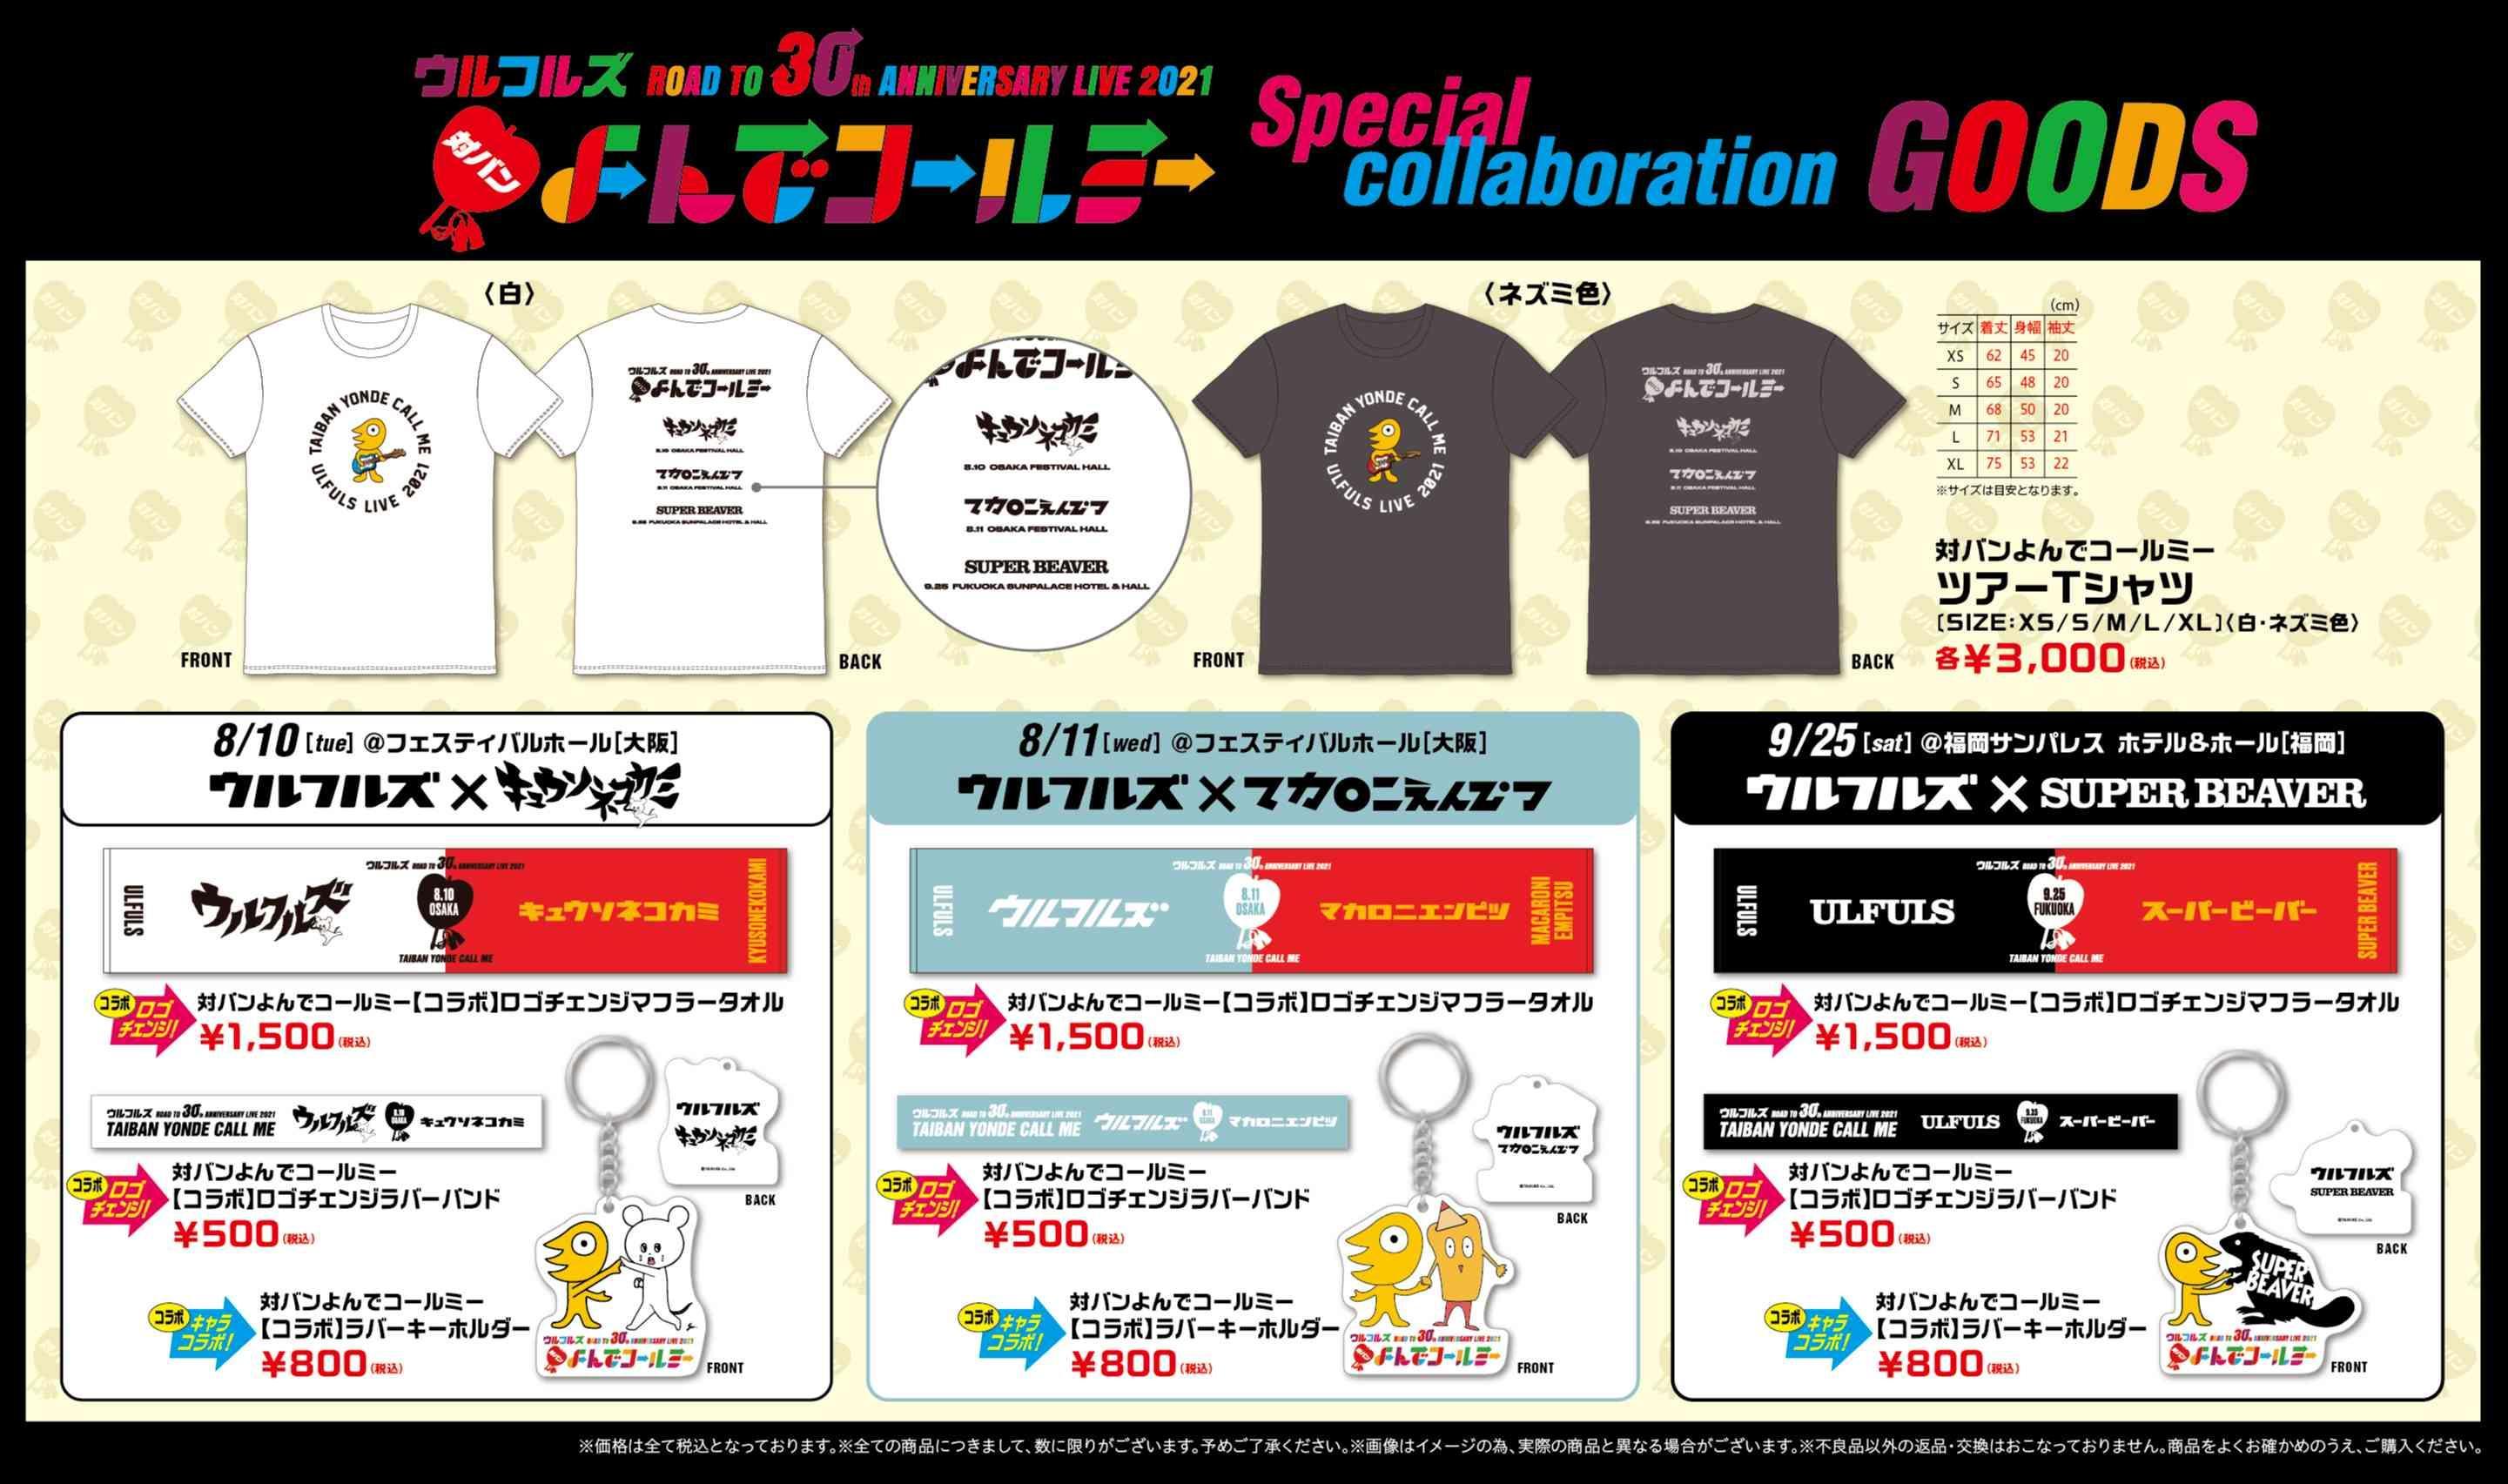 U21taiban-goods_information image(0713ver).jpg